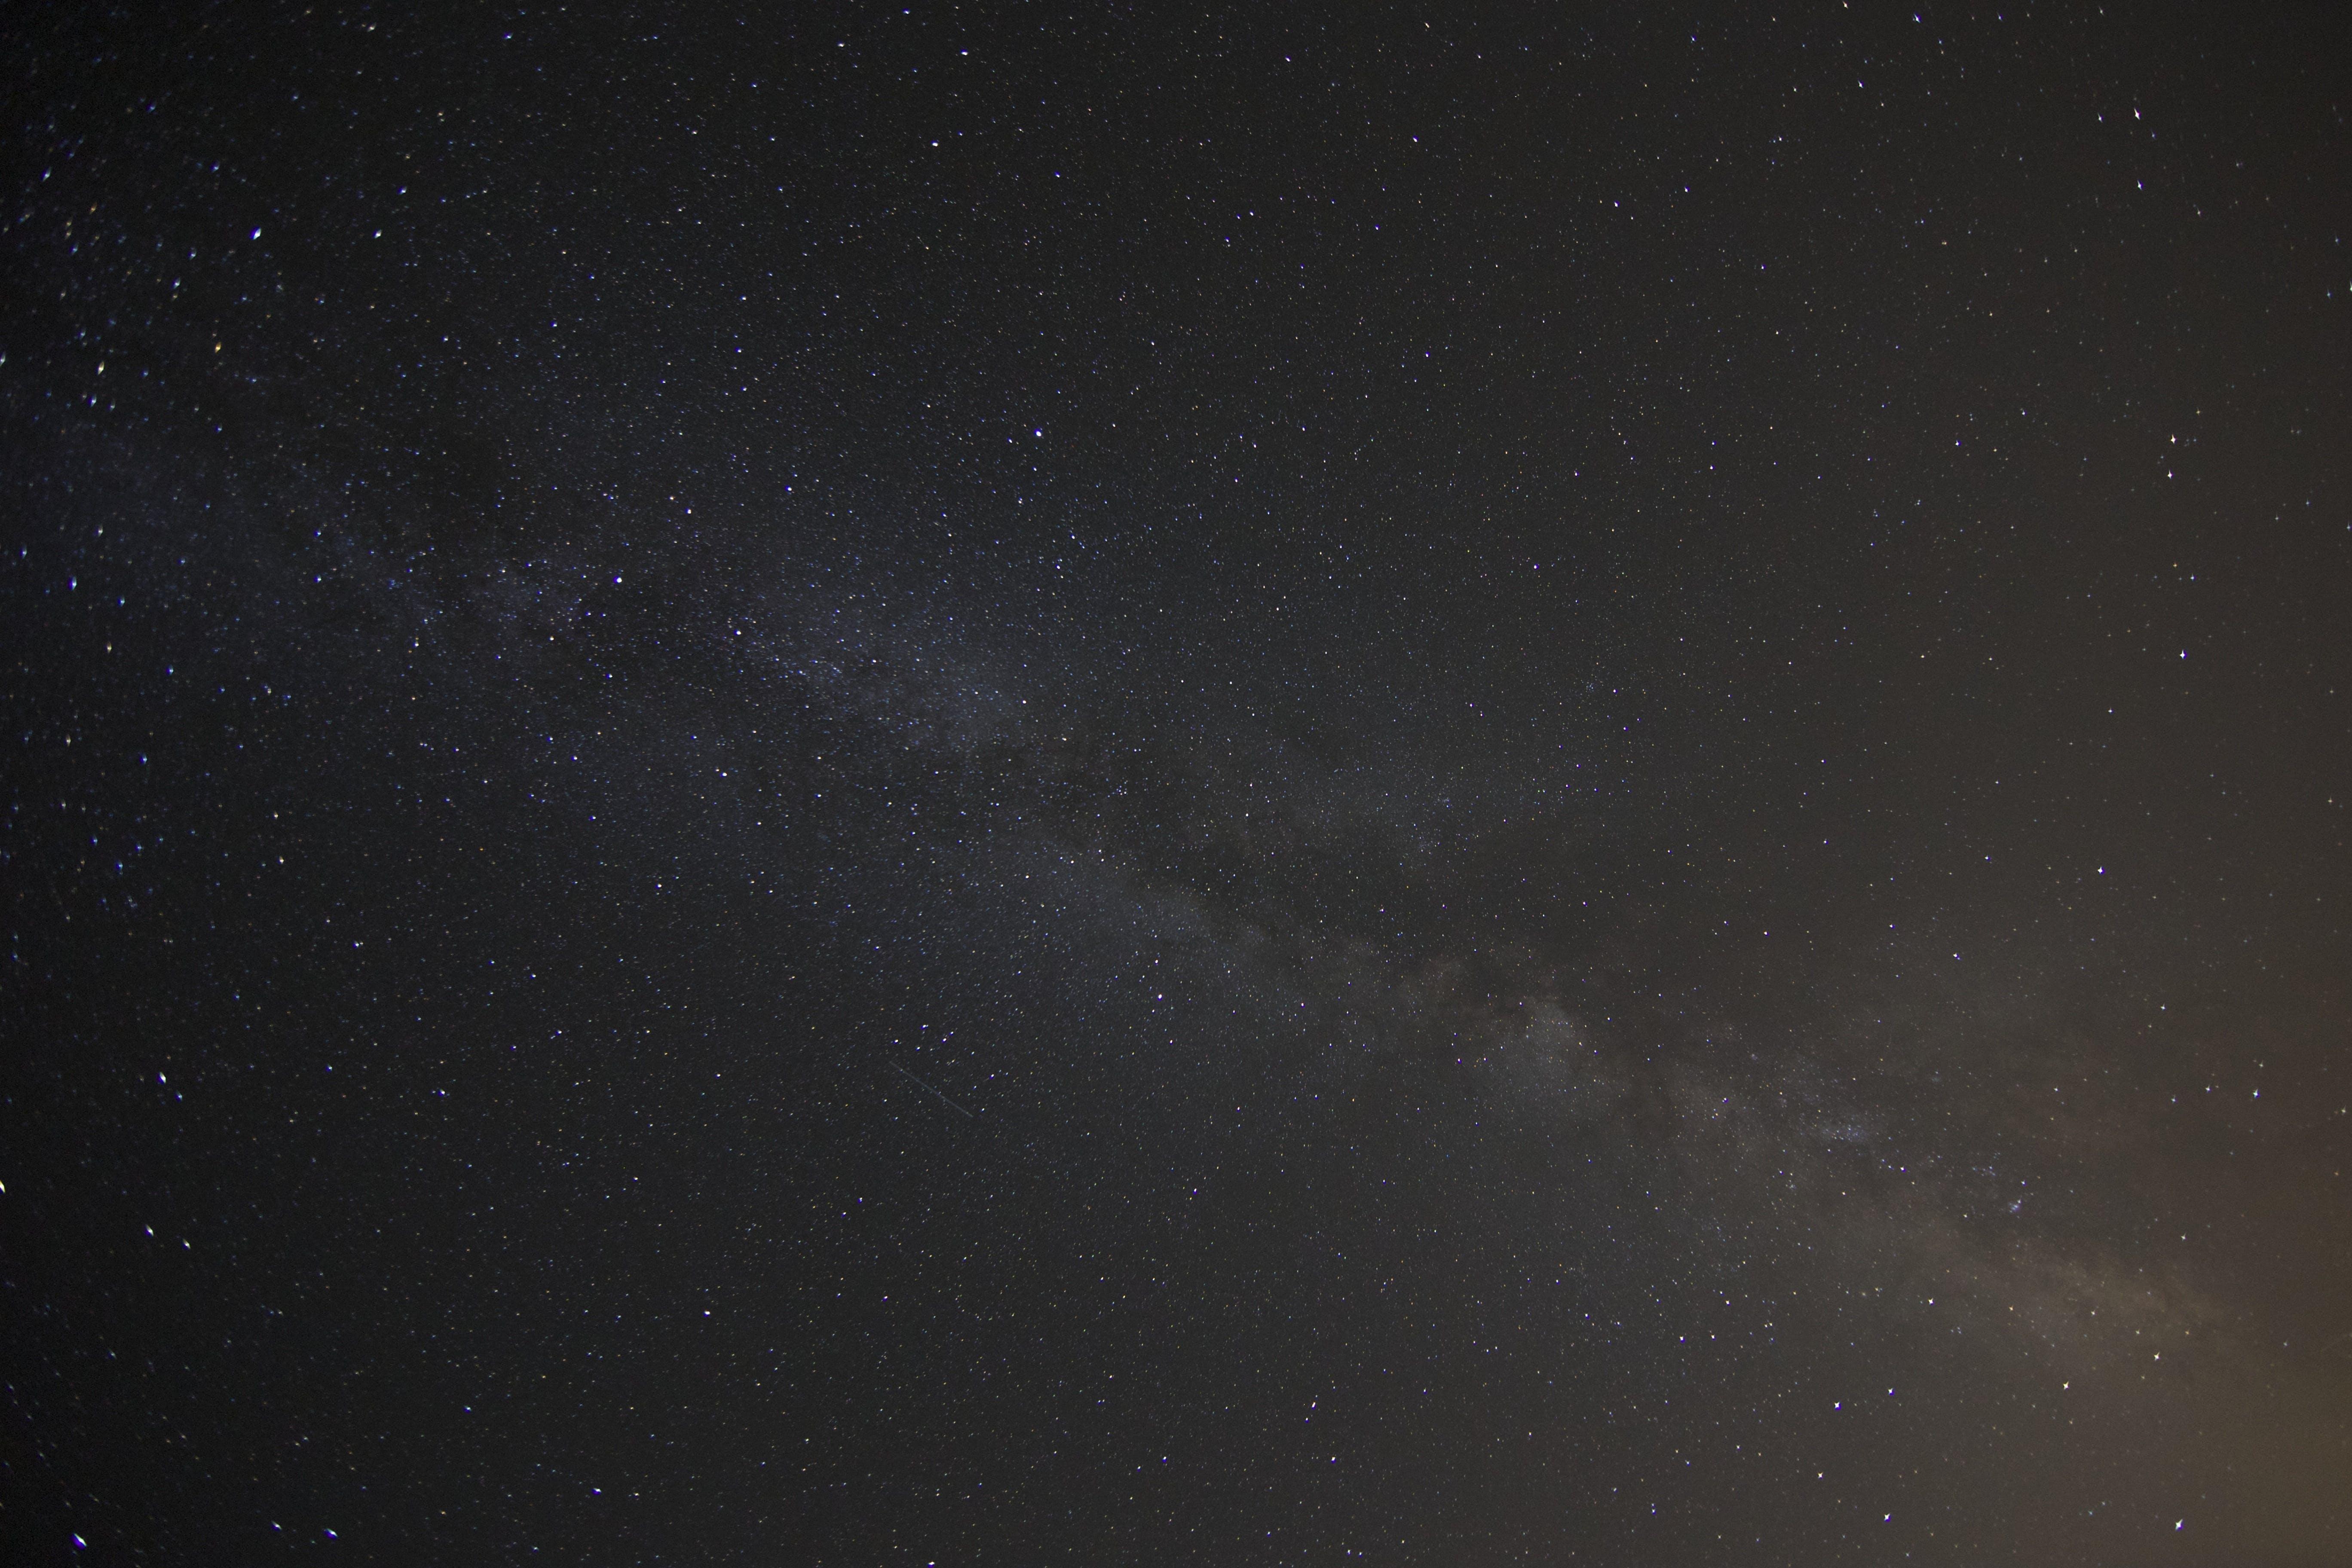 White Starry Dark Sky during Nighttime